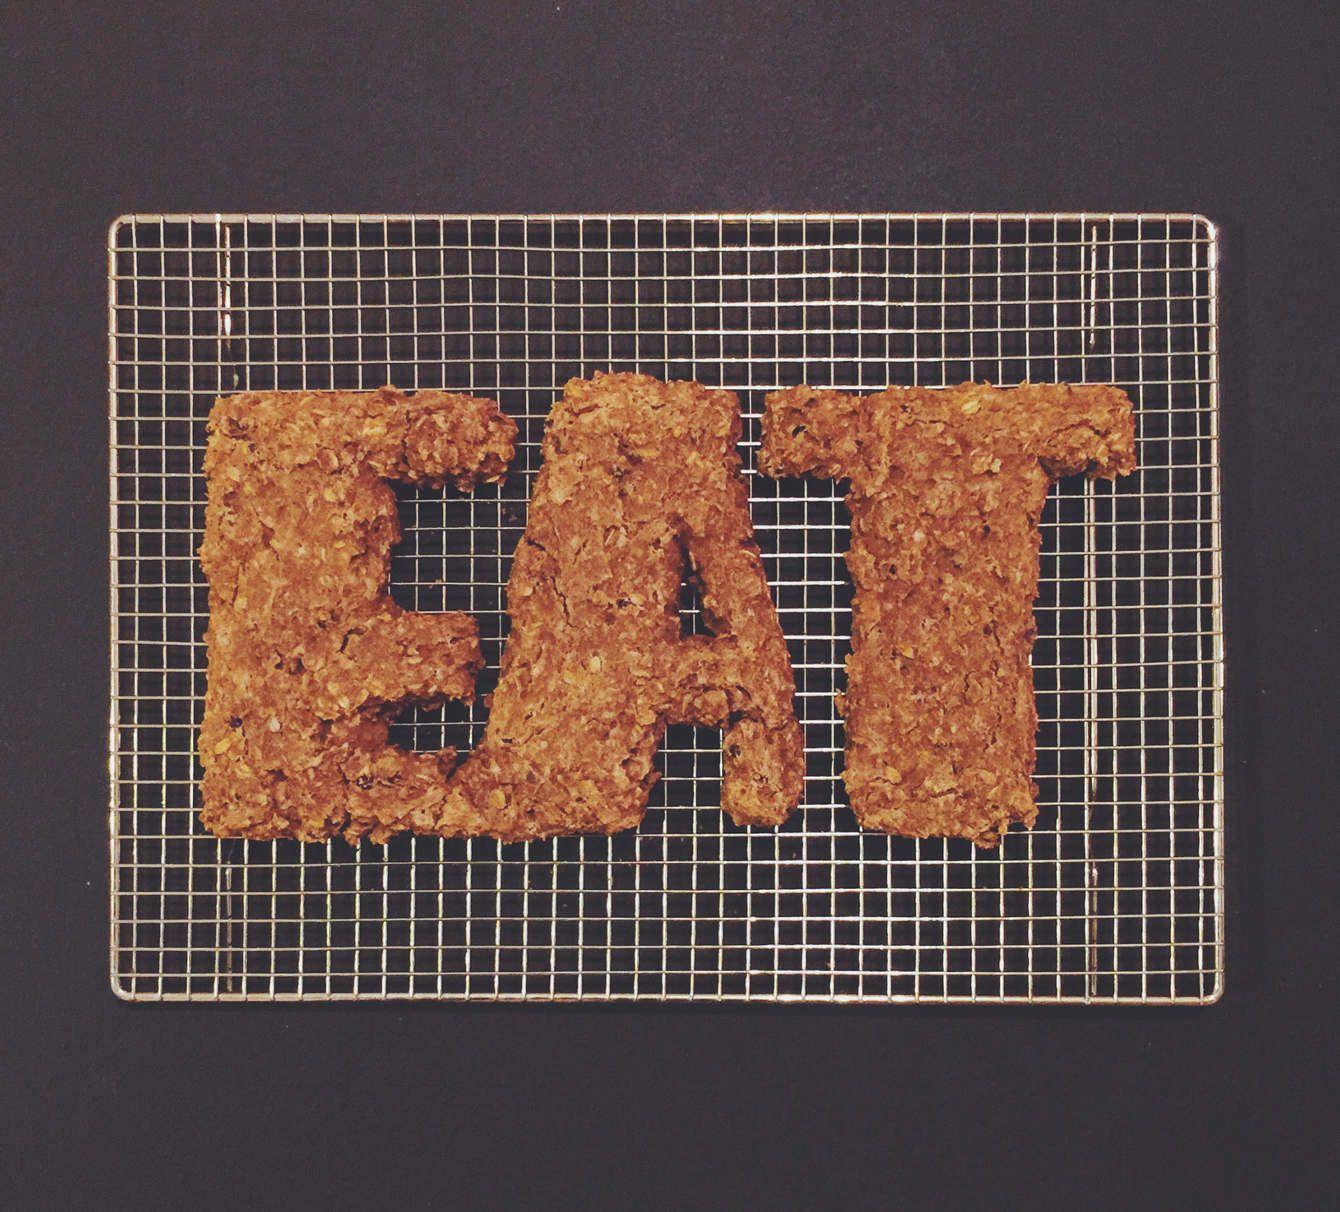 RANDOM FOOD LETTERING - Becca Clason - Lettering Artist & Stop-Motion Animator